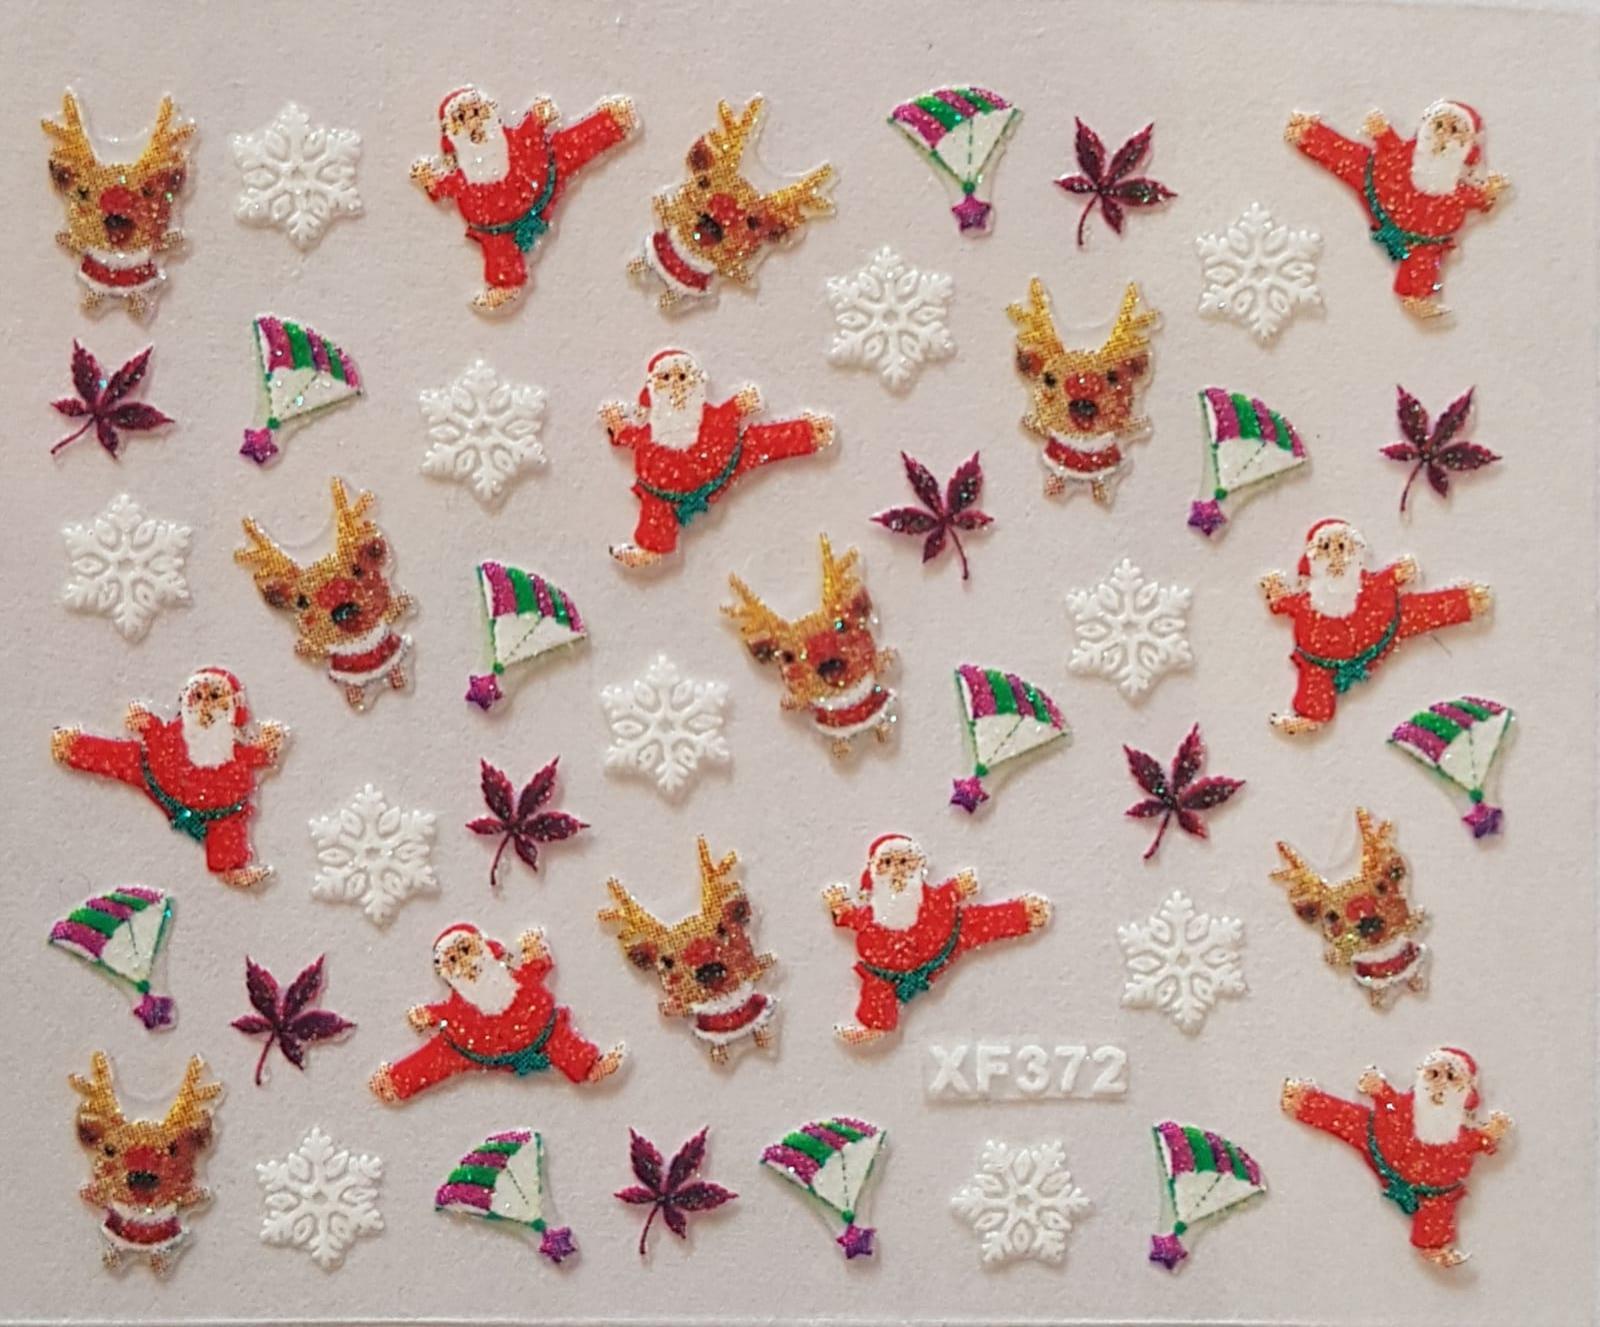 Stickers navideños xf-372